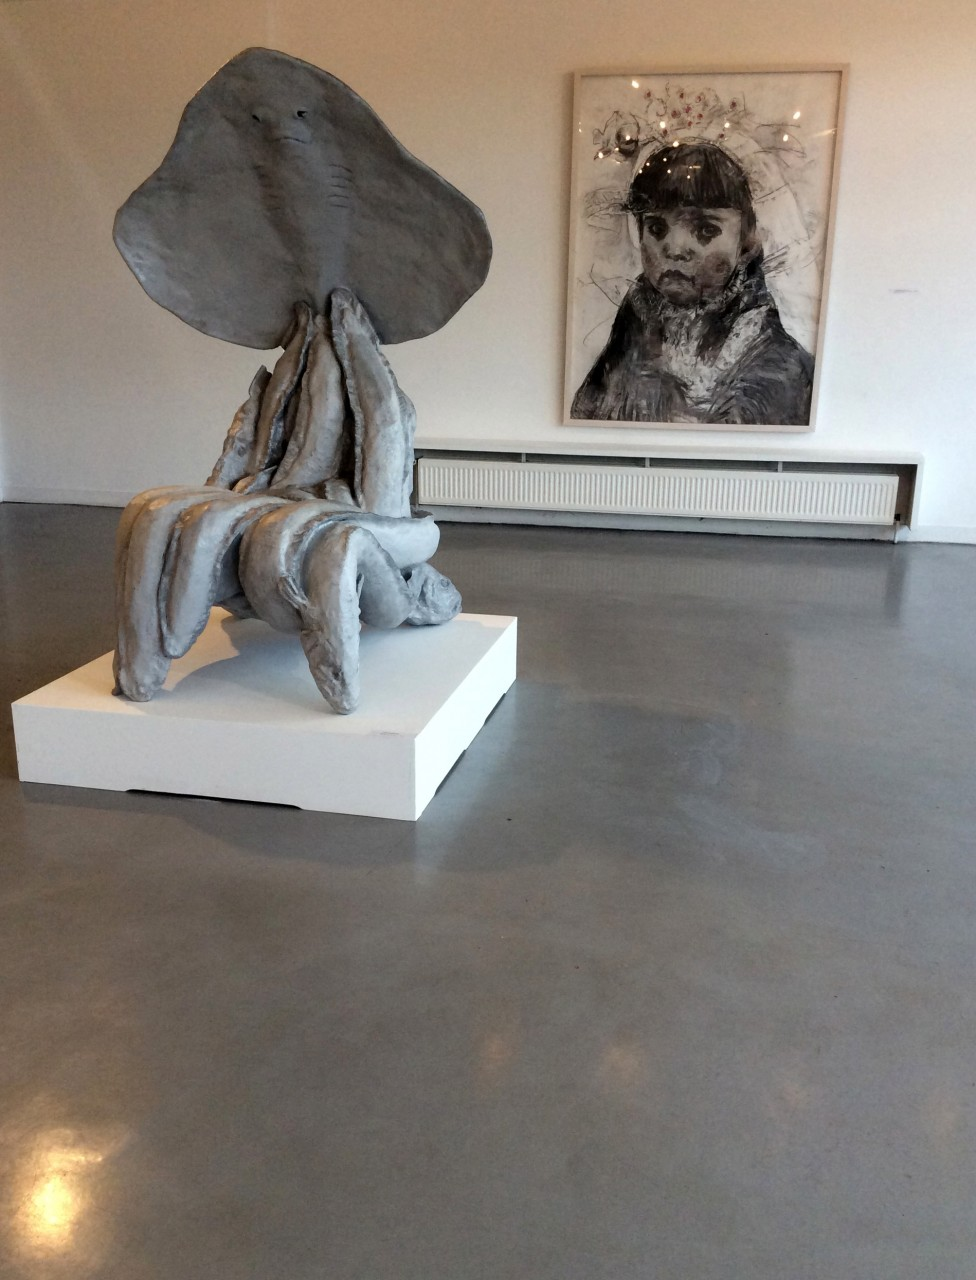 exposition-galerie-julio-gonzalez-laurent-esquerre-1